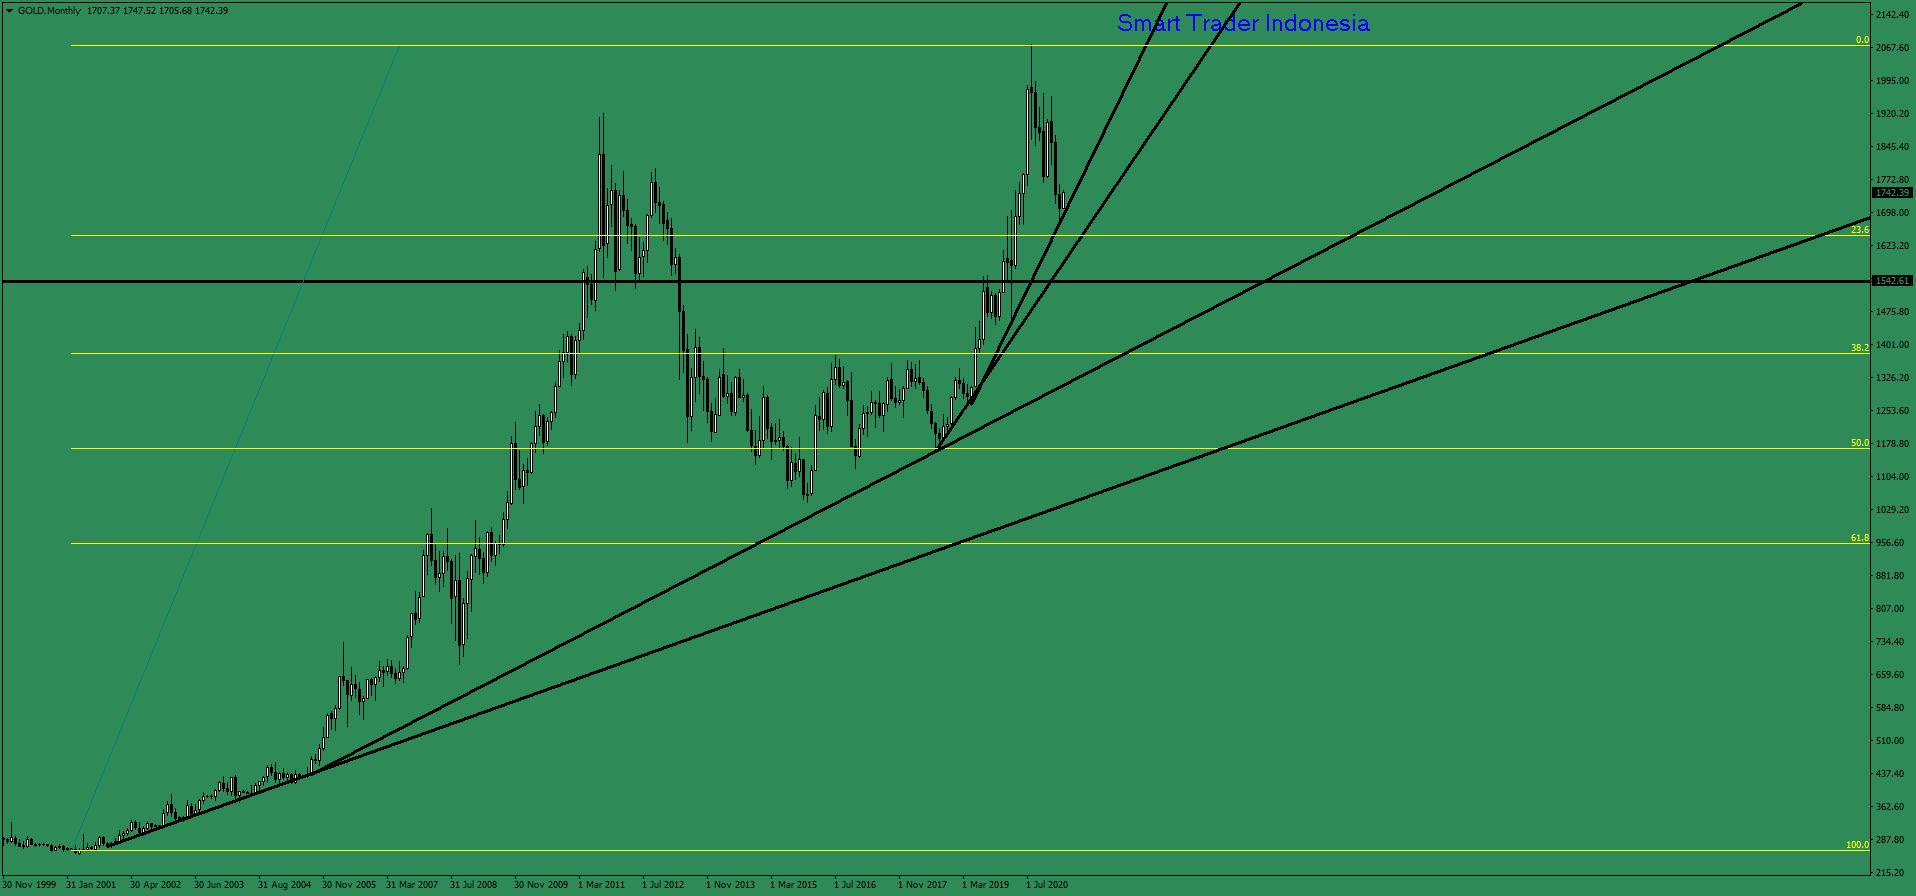 gold-mn1-ava-trade-ltd.png